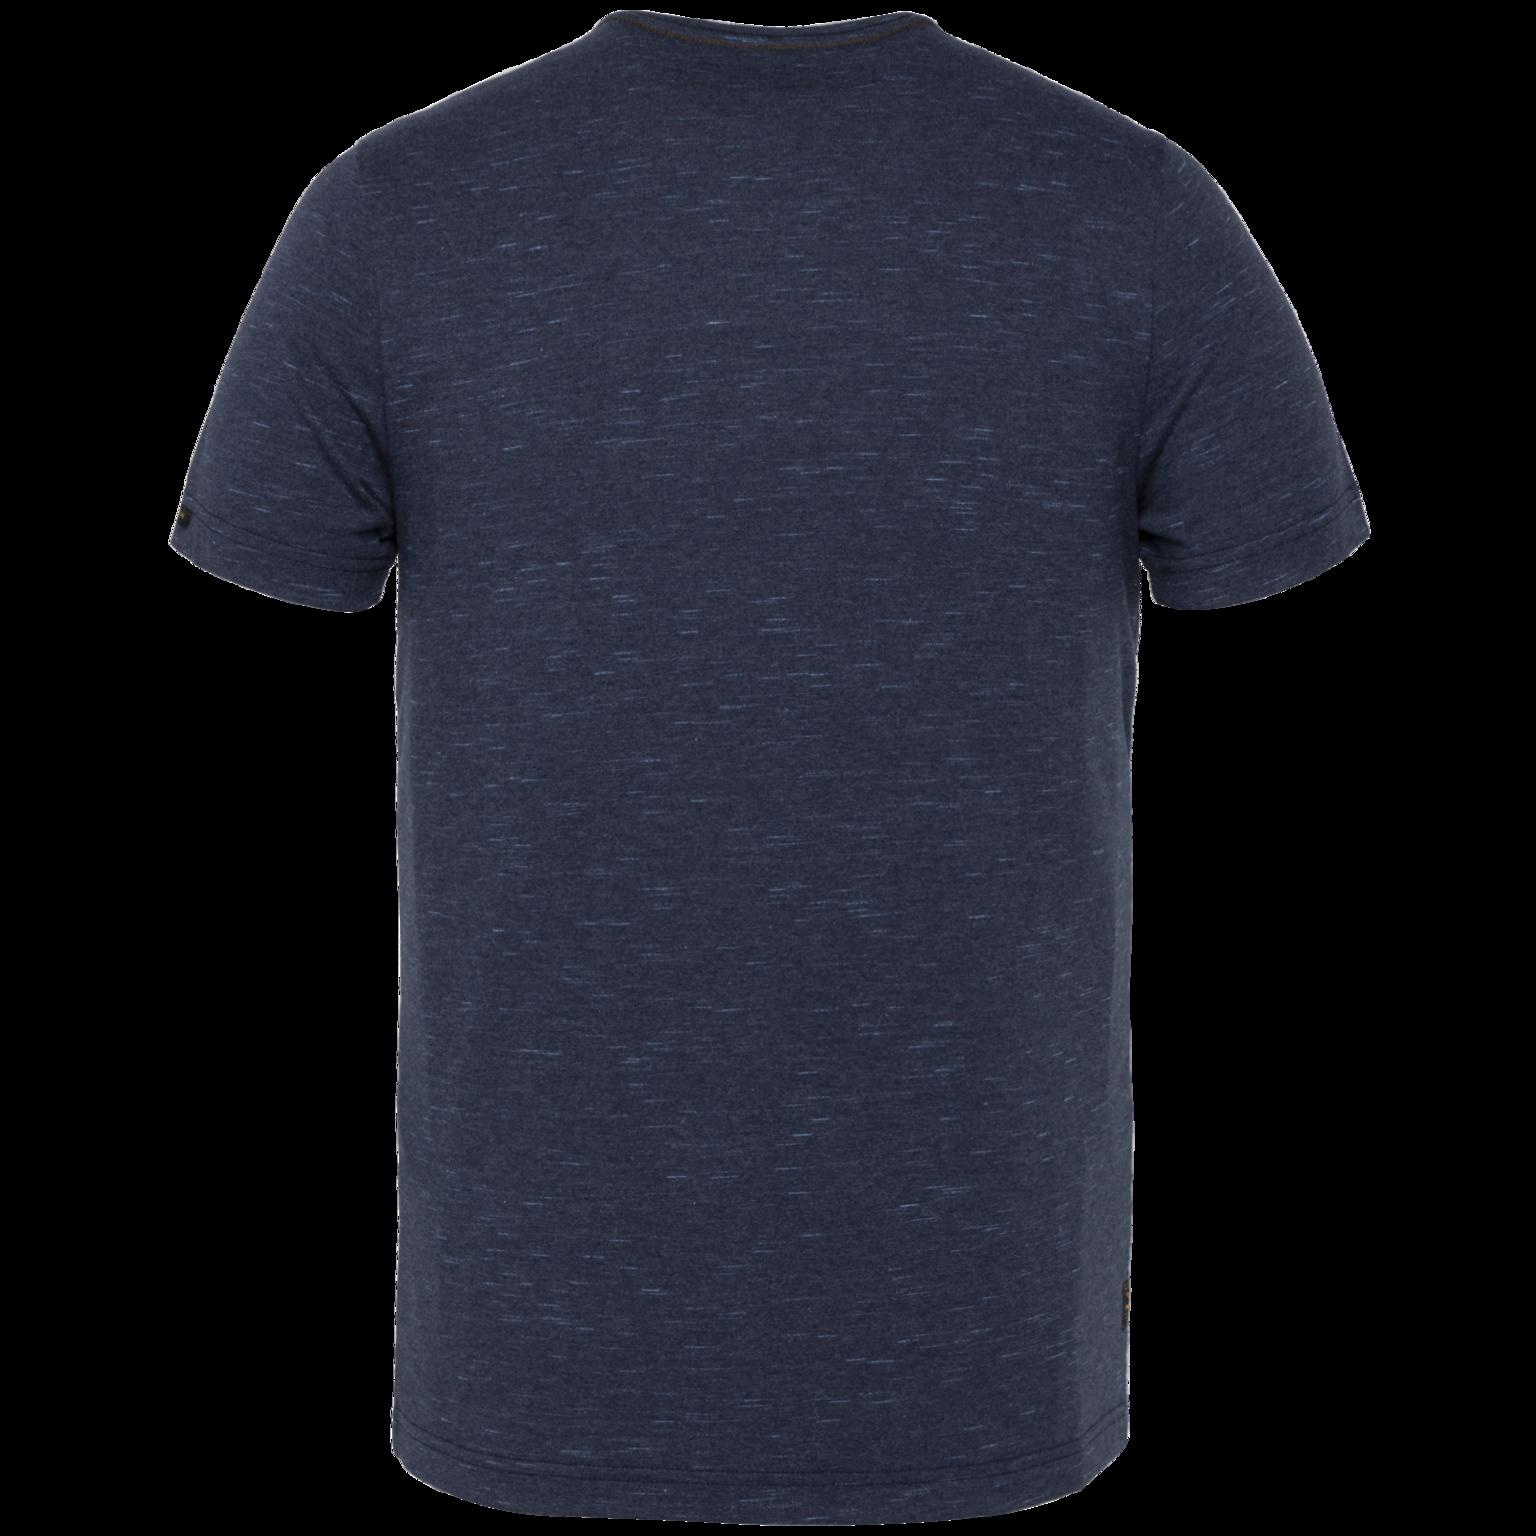 PME t-shirt melange jersey-2